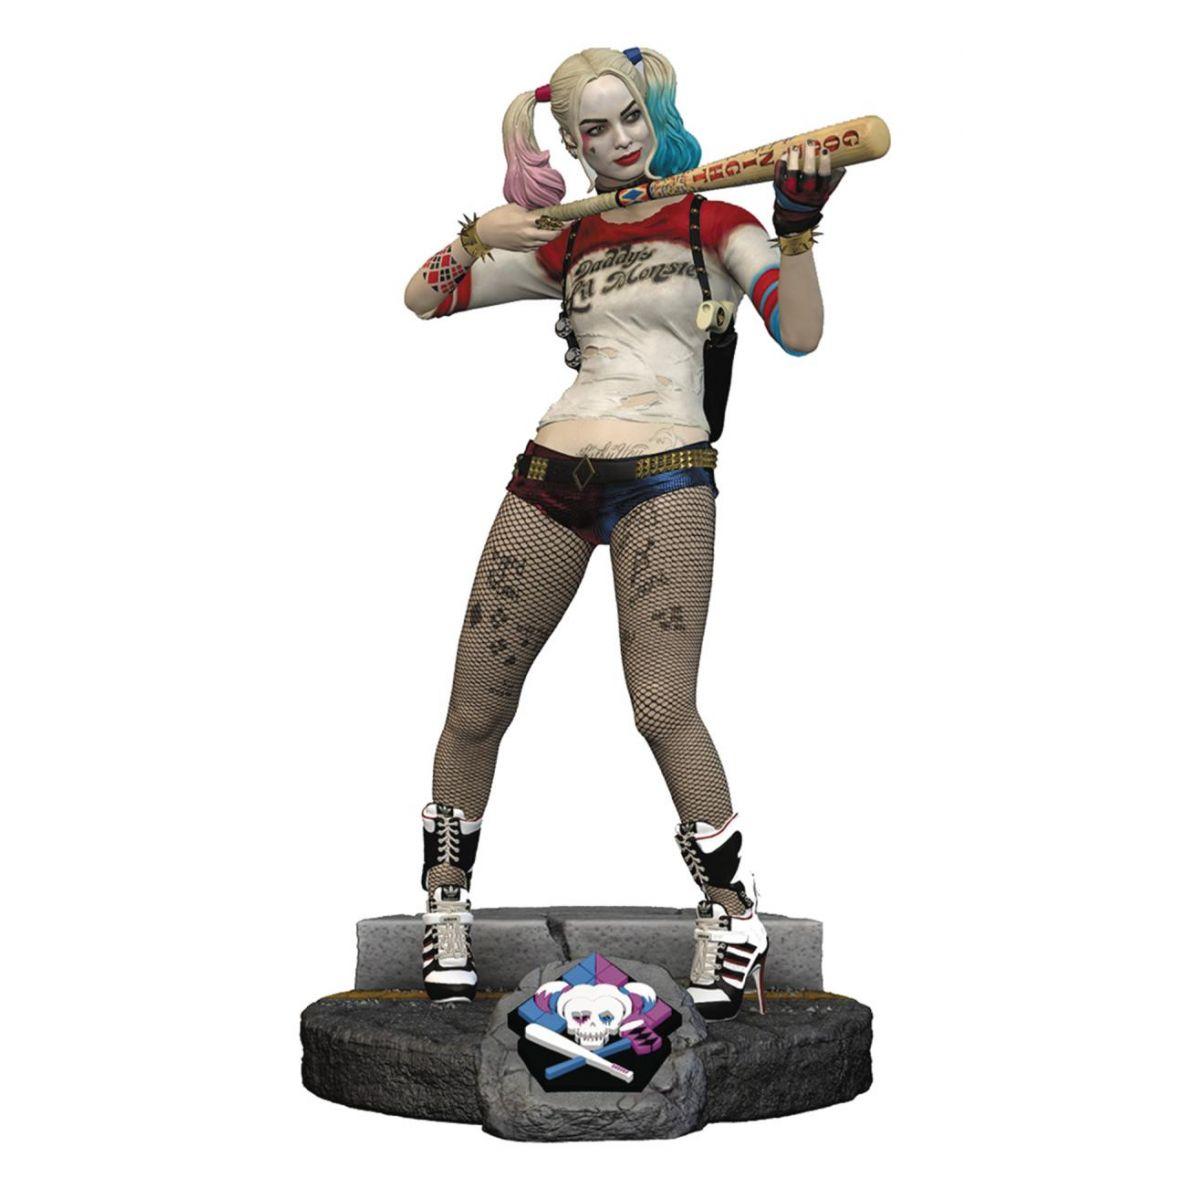 Estátua Harley Quinn Escala 1/6: Esquadrão Suicida (Suicide Squad) Finders Keypers - Elephant Gun LLC